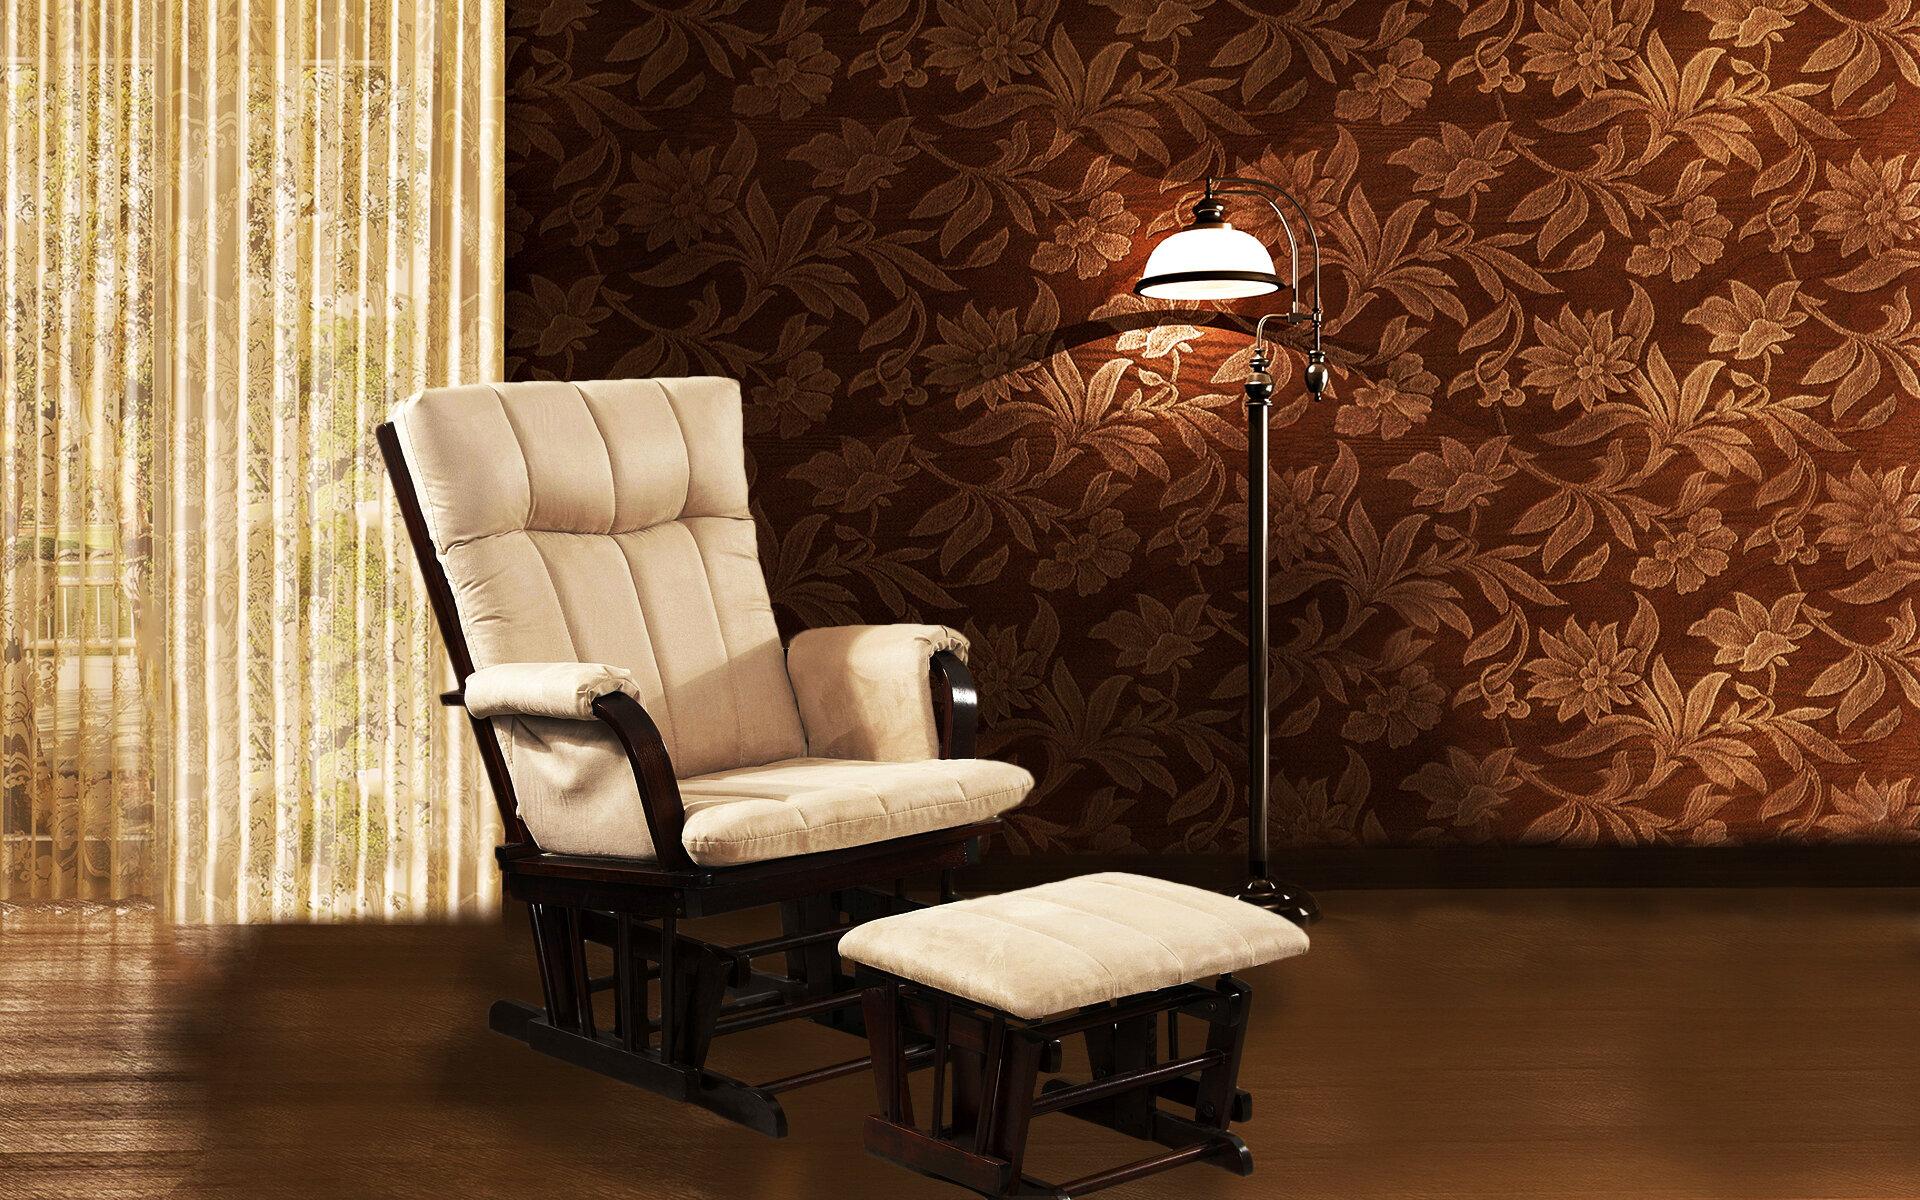 Dake Glider Chair And Ottoman